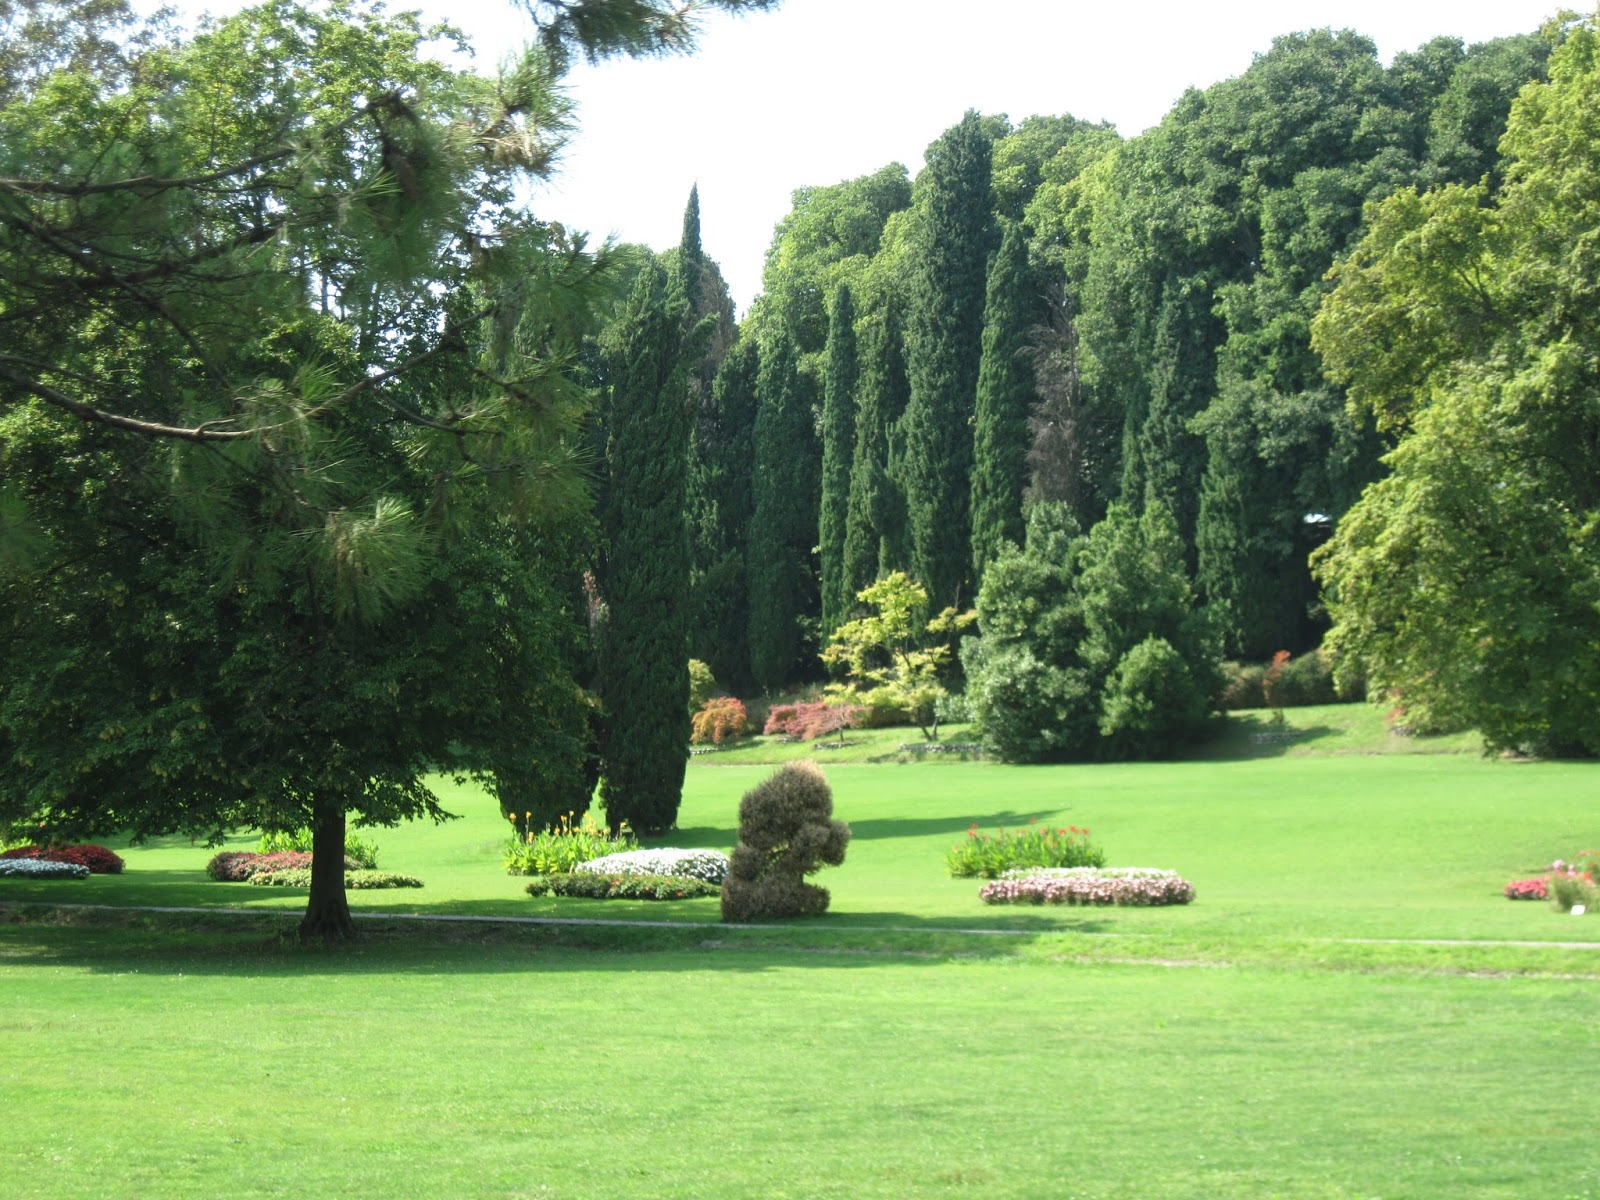 Soffio parco sigurta 39 a valeggio sul mincio - Parco giardino sigurta valeggio sul mincio vr ...